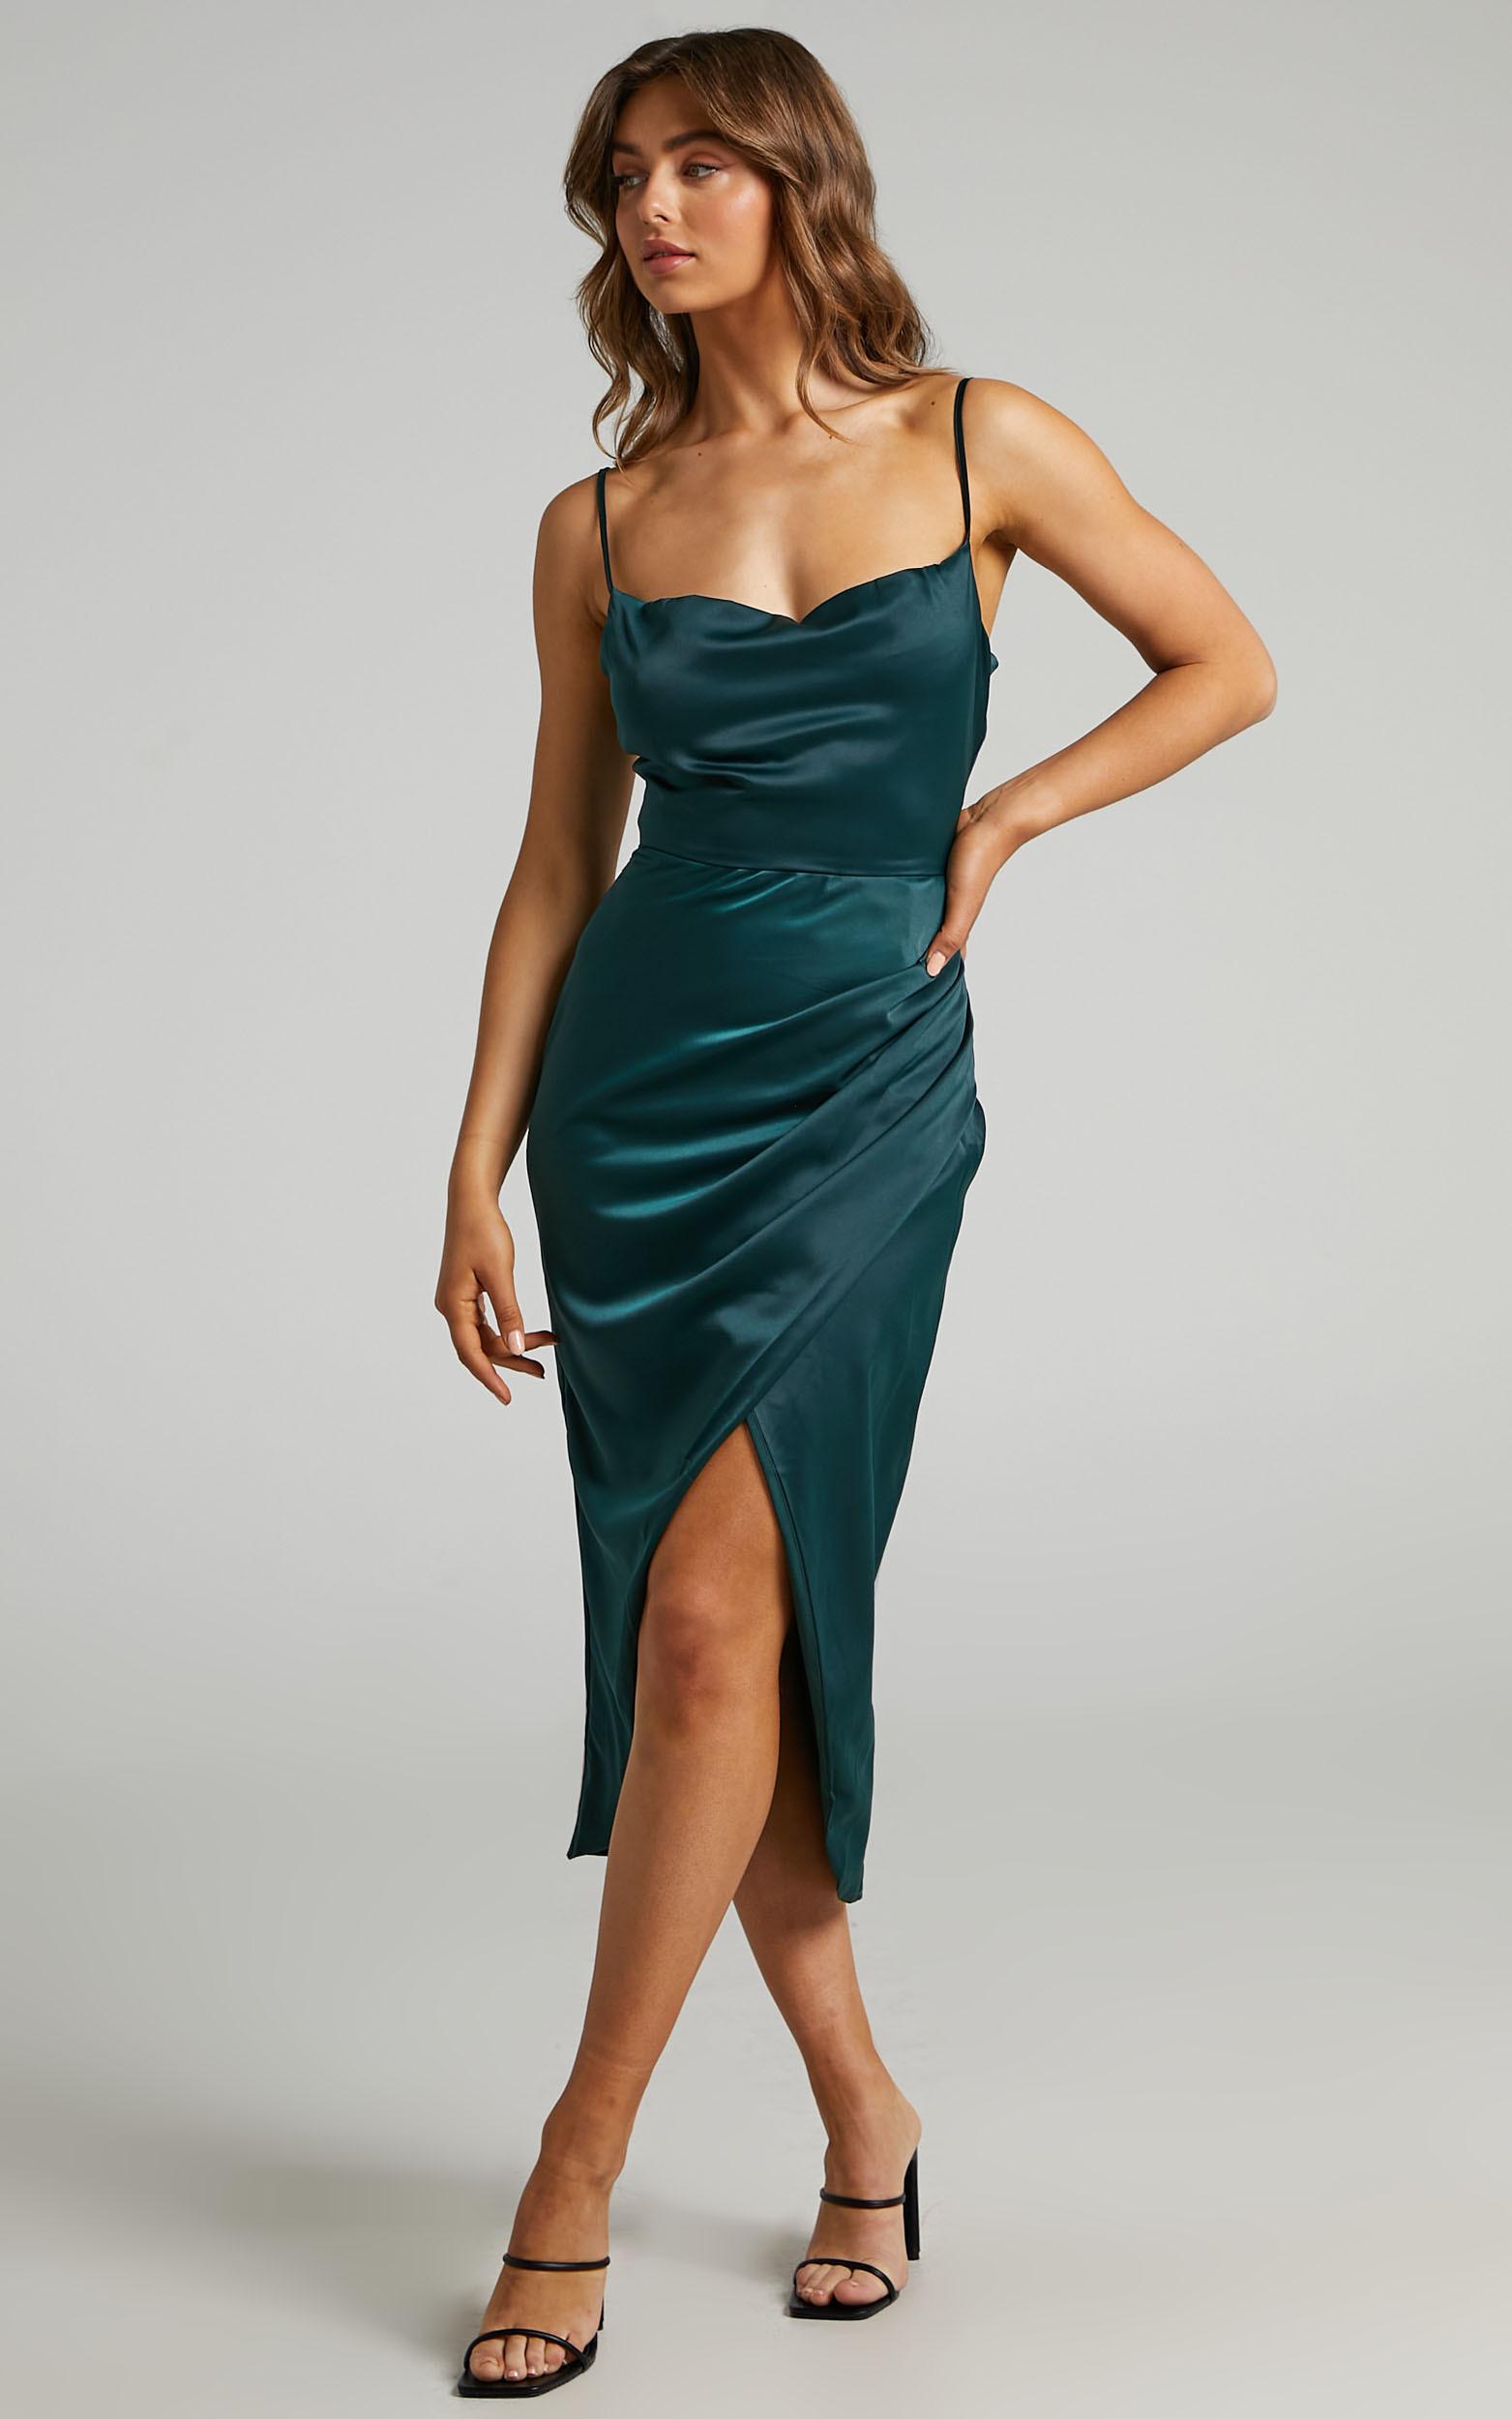 Dazzling Lights Dress in Emerald Satin - 06, GRN3, hi-res image number null